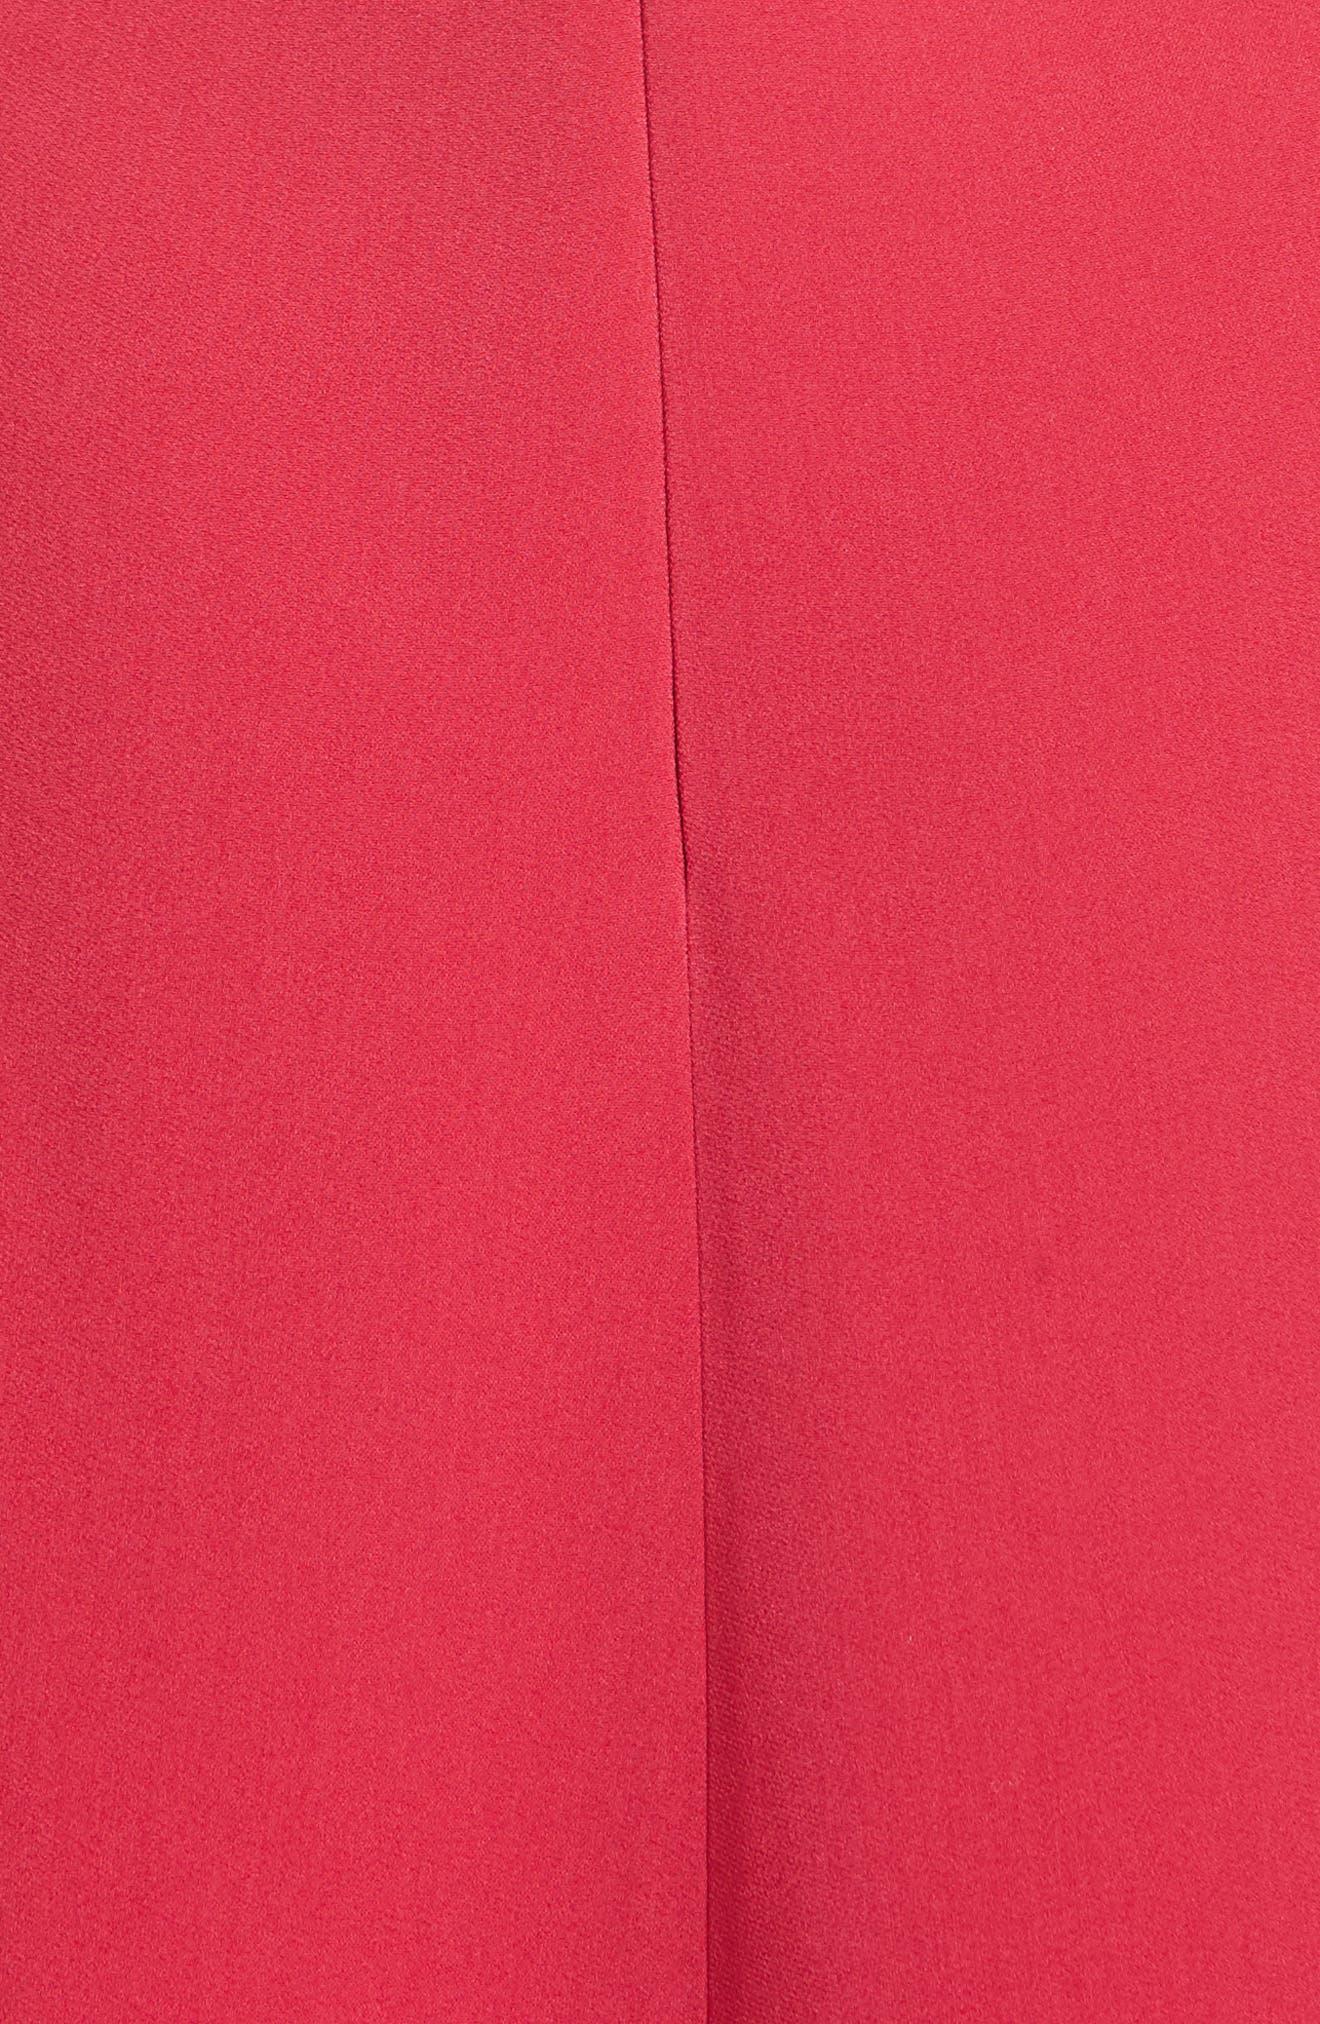 Draped Stretch Cady Dress,                             Alternate thumbnail 5, color,                             650